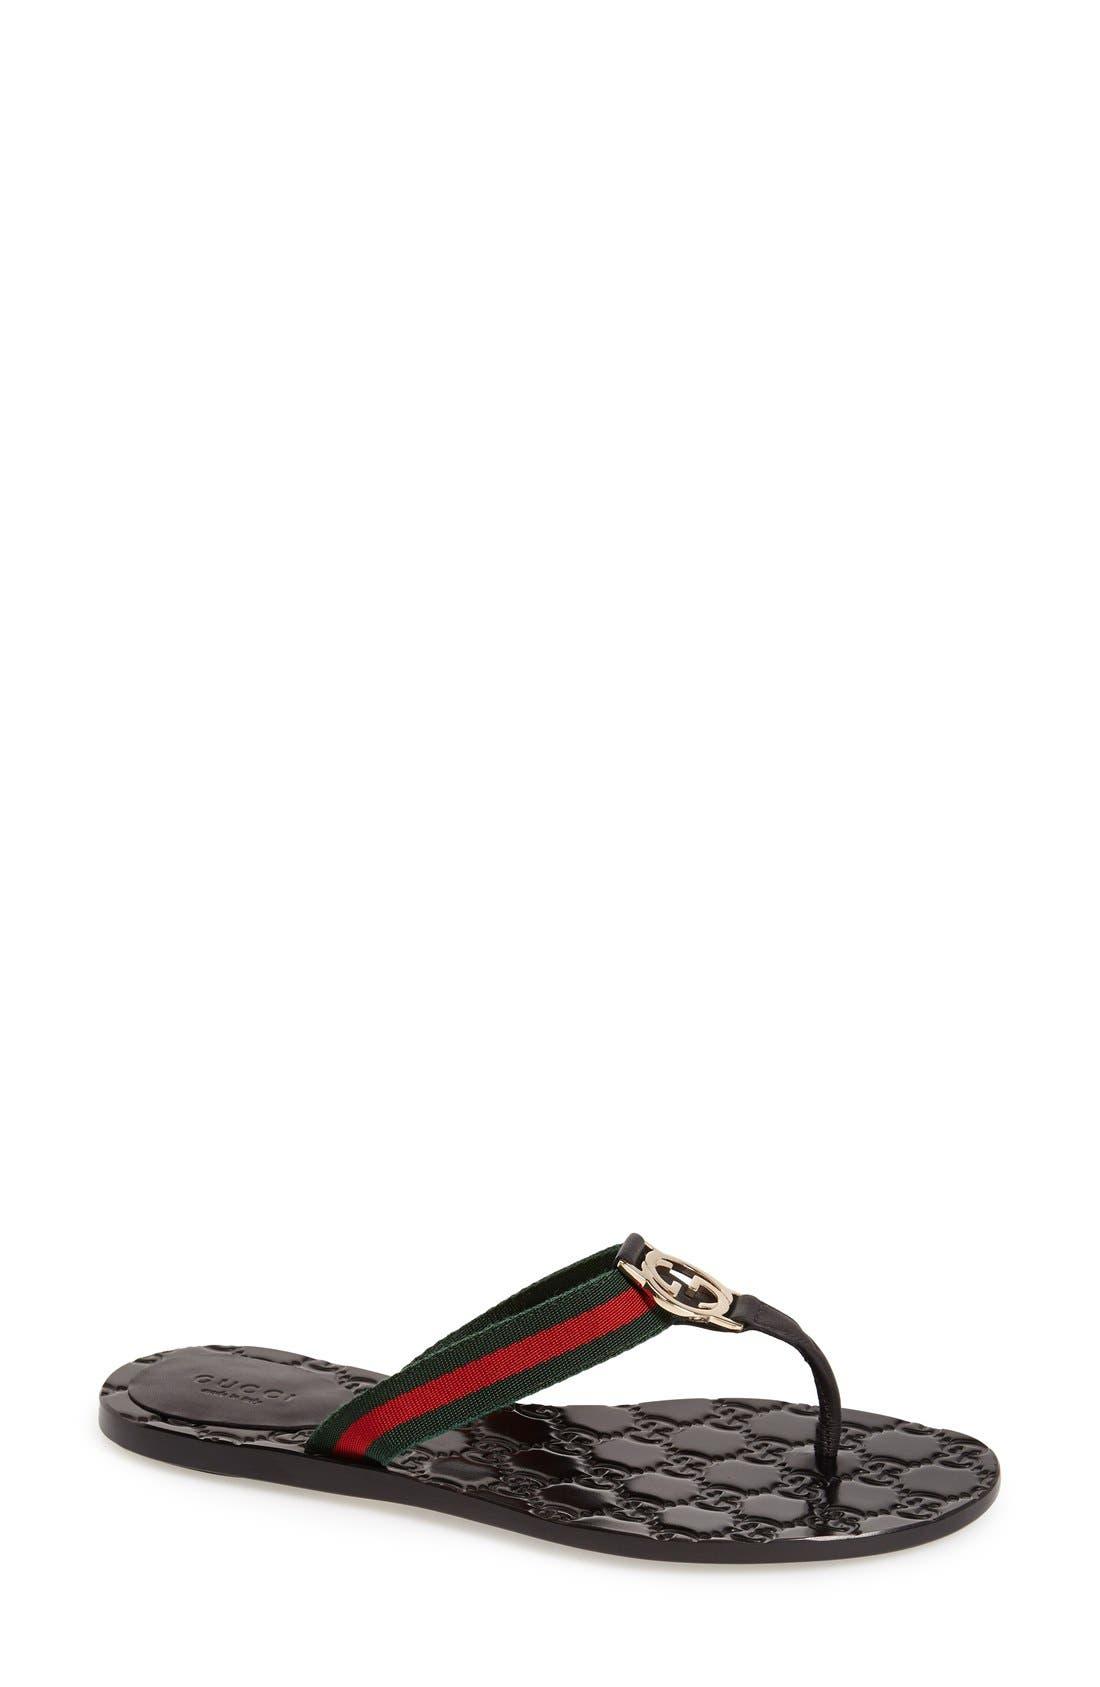 GUCCI,                             'GG' Logo Sandal,                             Main thumbnail 1, color,                             NERO